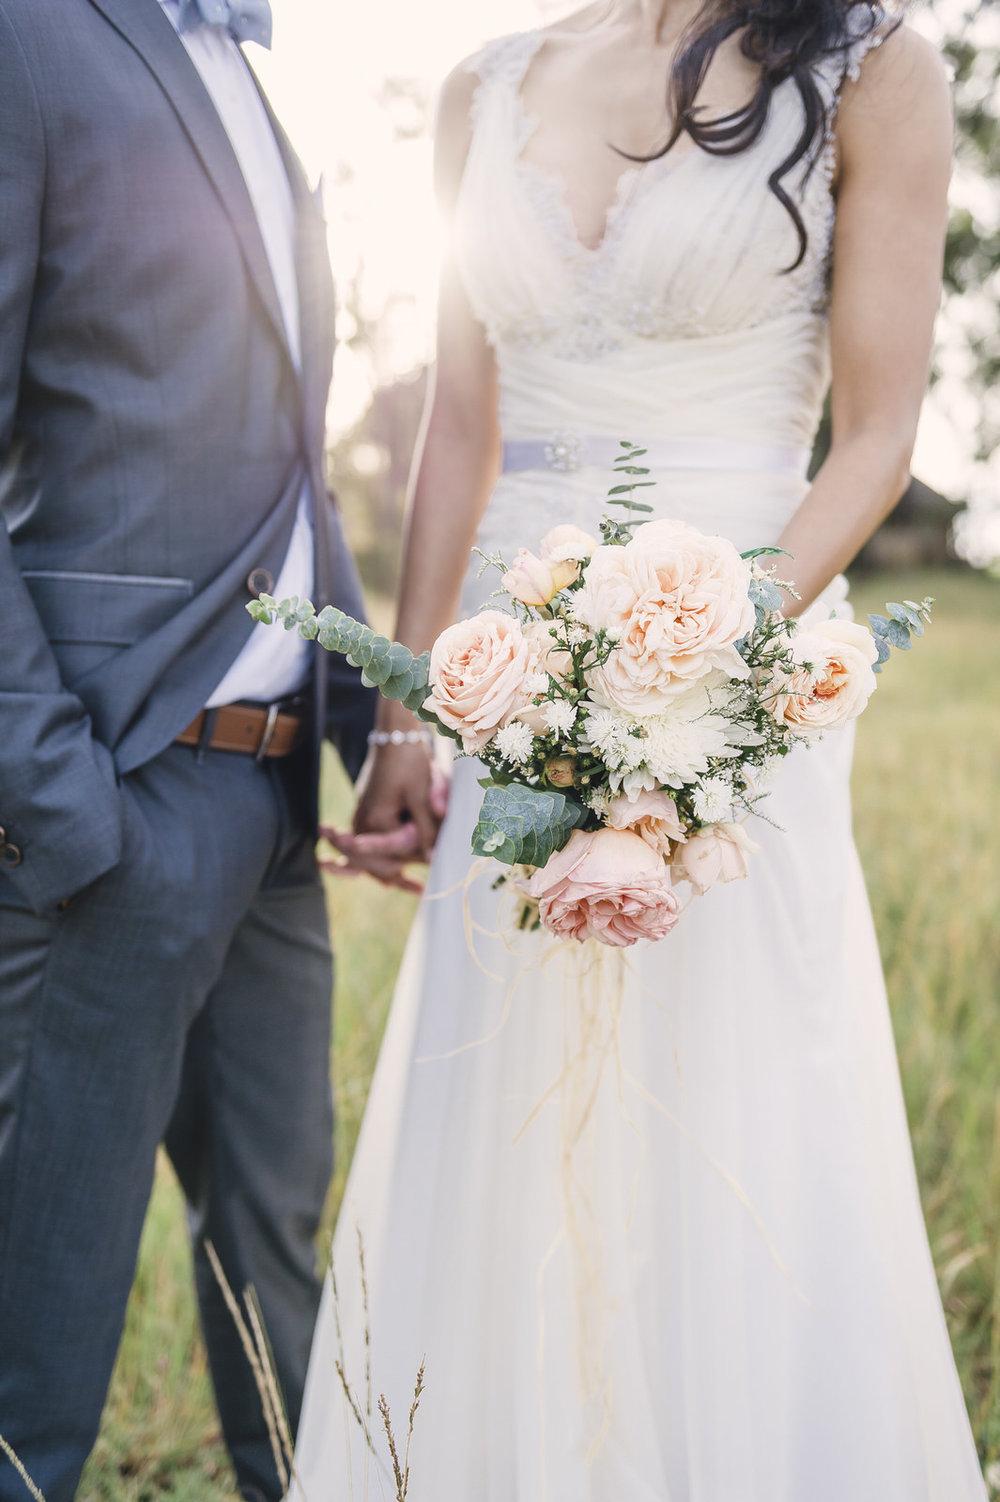 RyanParker_FineArtPhotographer_Wedding_CapeTown_DSC_1519.jpg